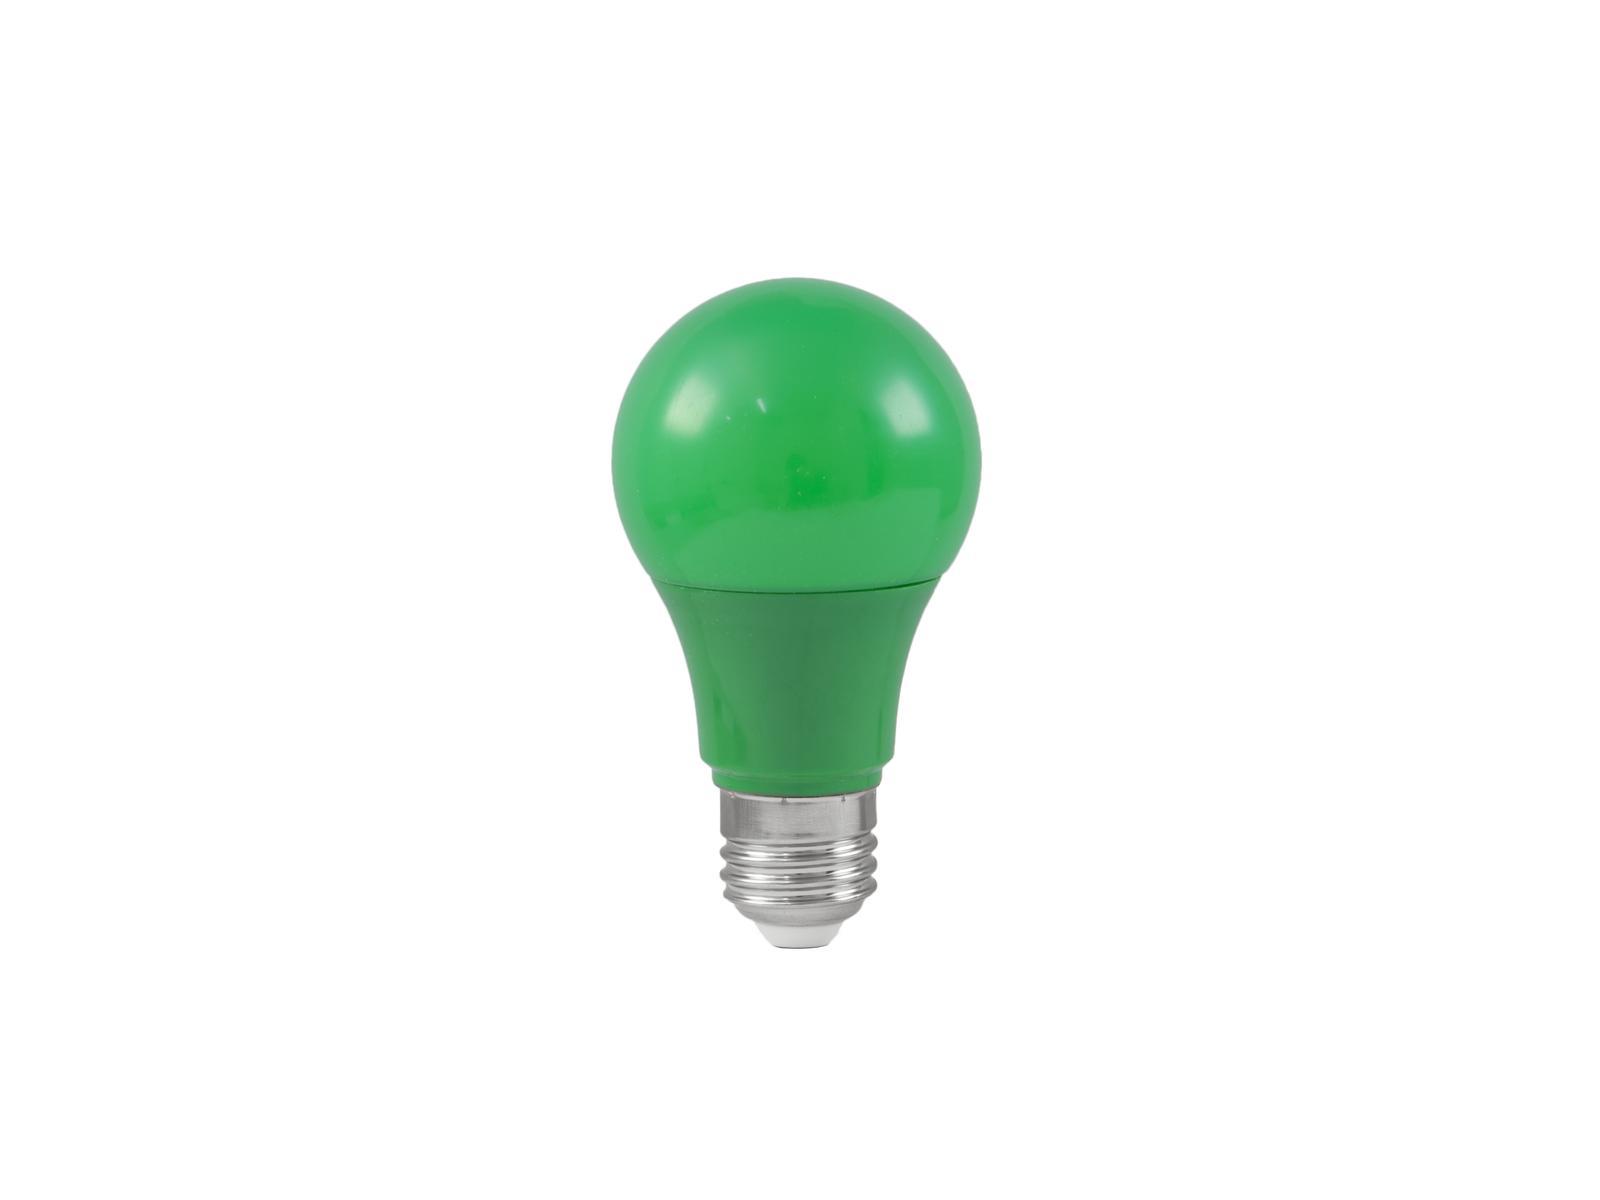 Lampada a led verde A60 230V 3W E-27 OMNILUX